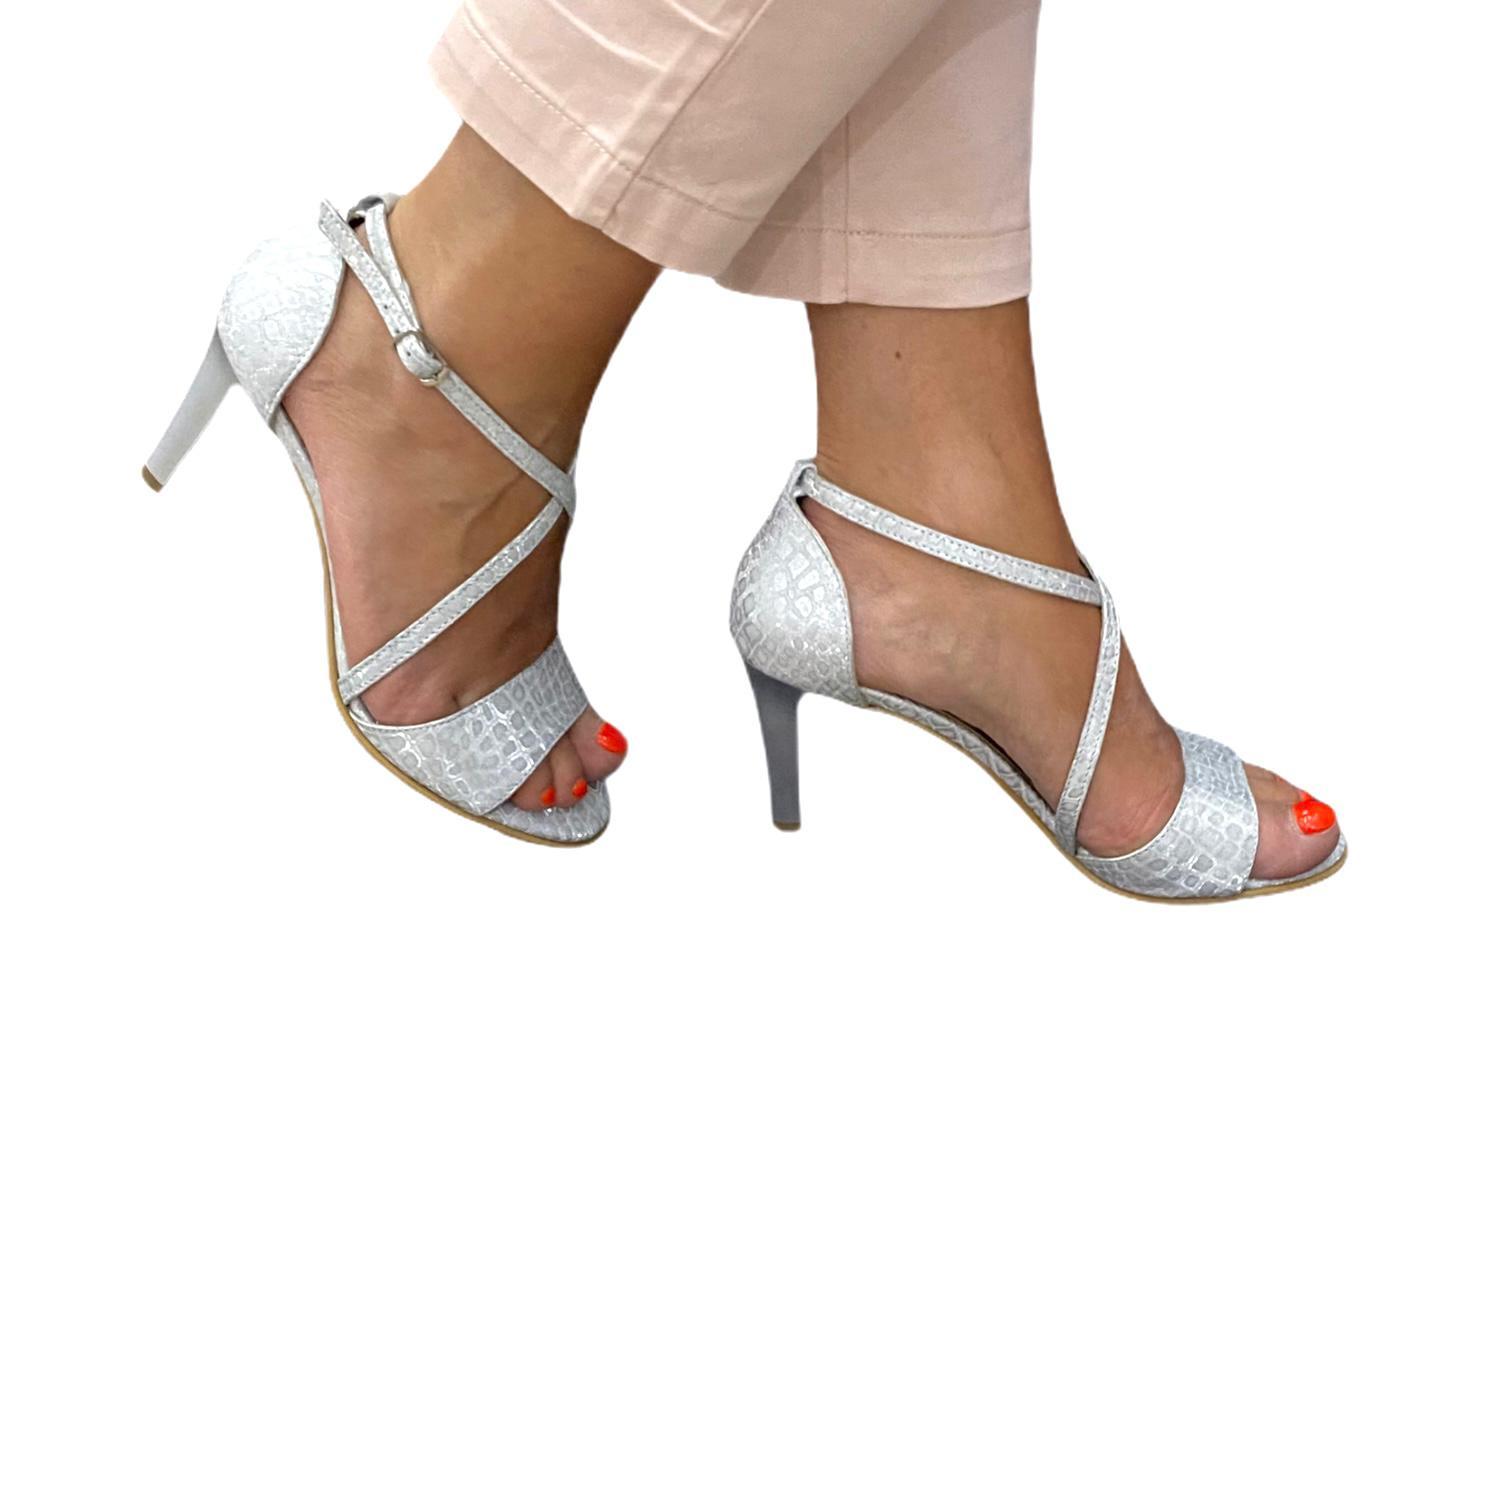 Sandale argintii cu imprimeu si barete incrucisate